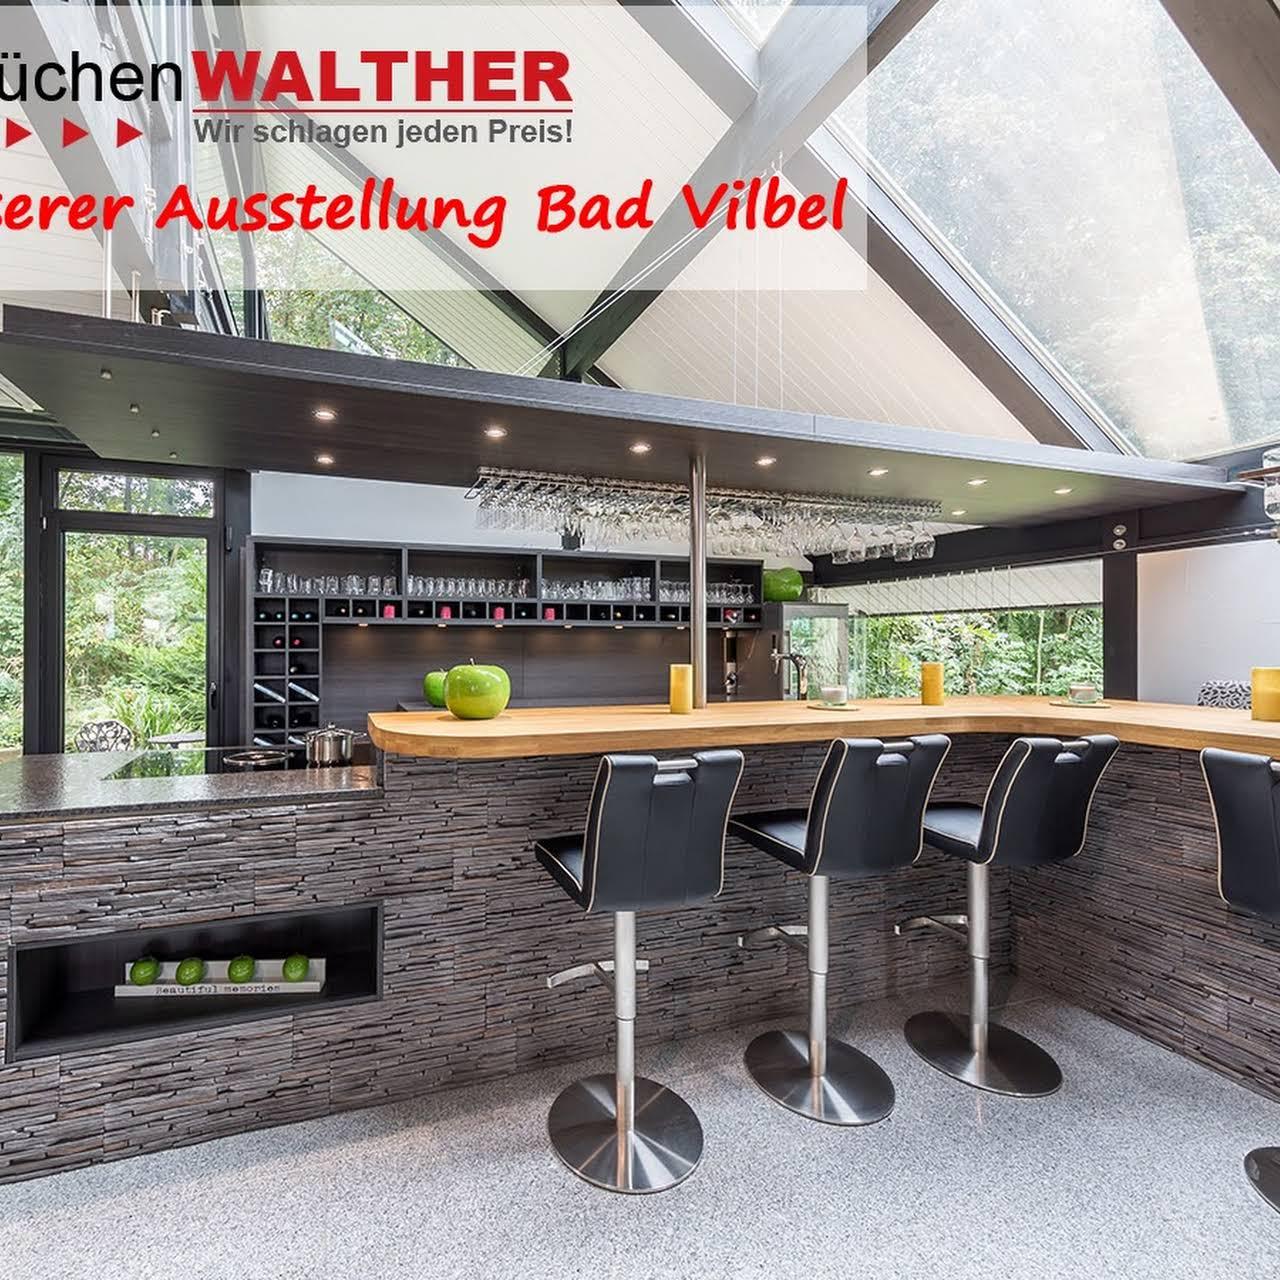 Kuchen Walther Bad Vilbel Zuhause Image Ideas